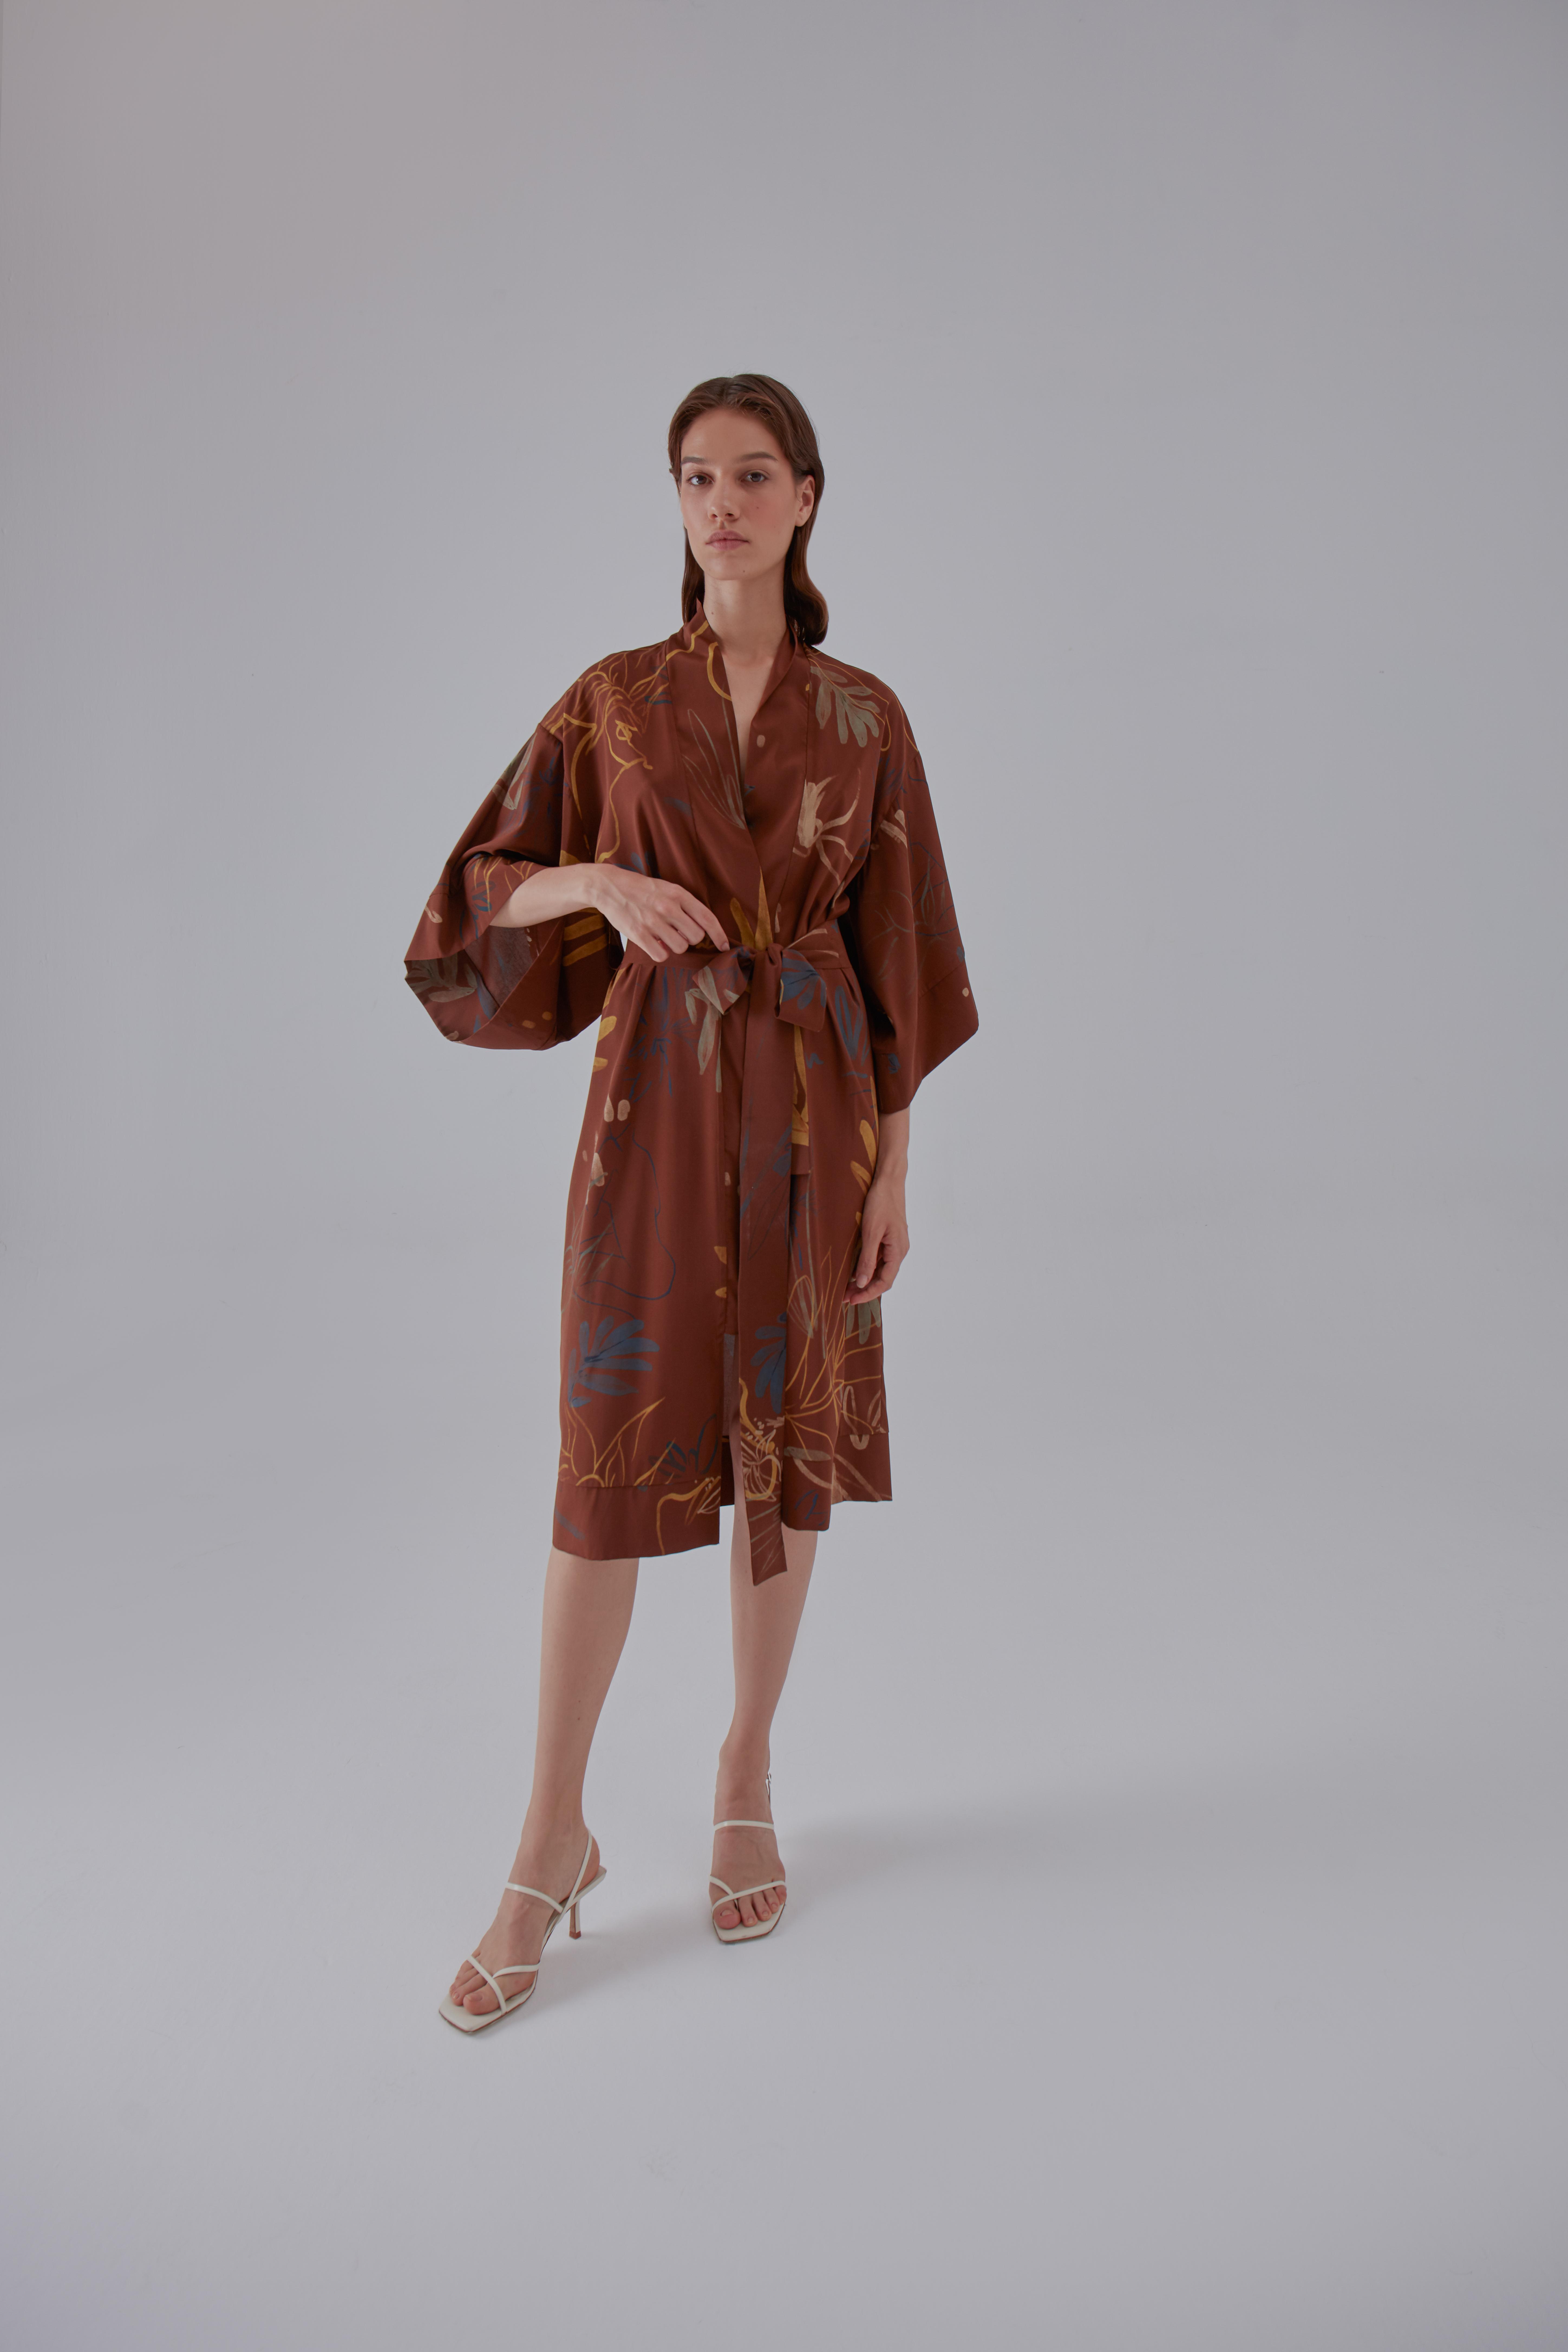 Yoko Kimono - Brown by Laika on curated-crowd.com